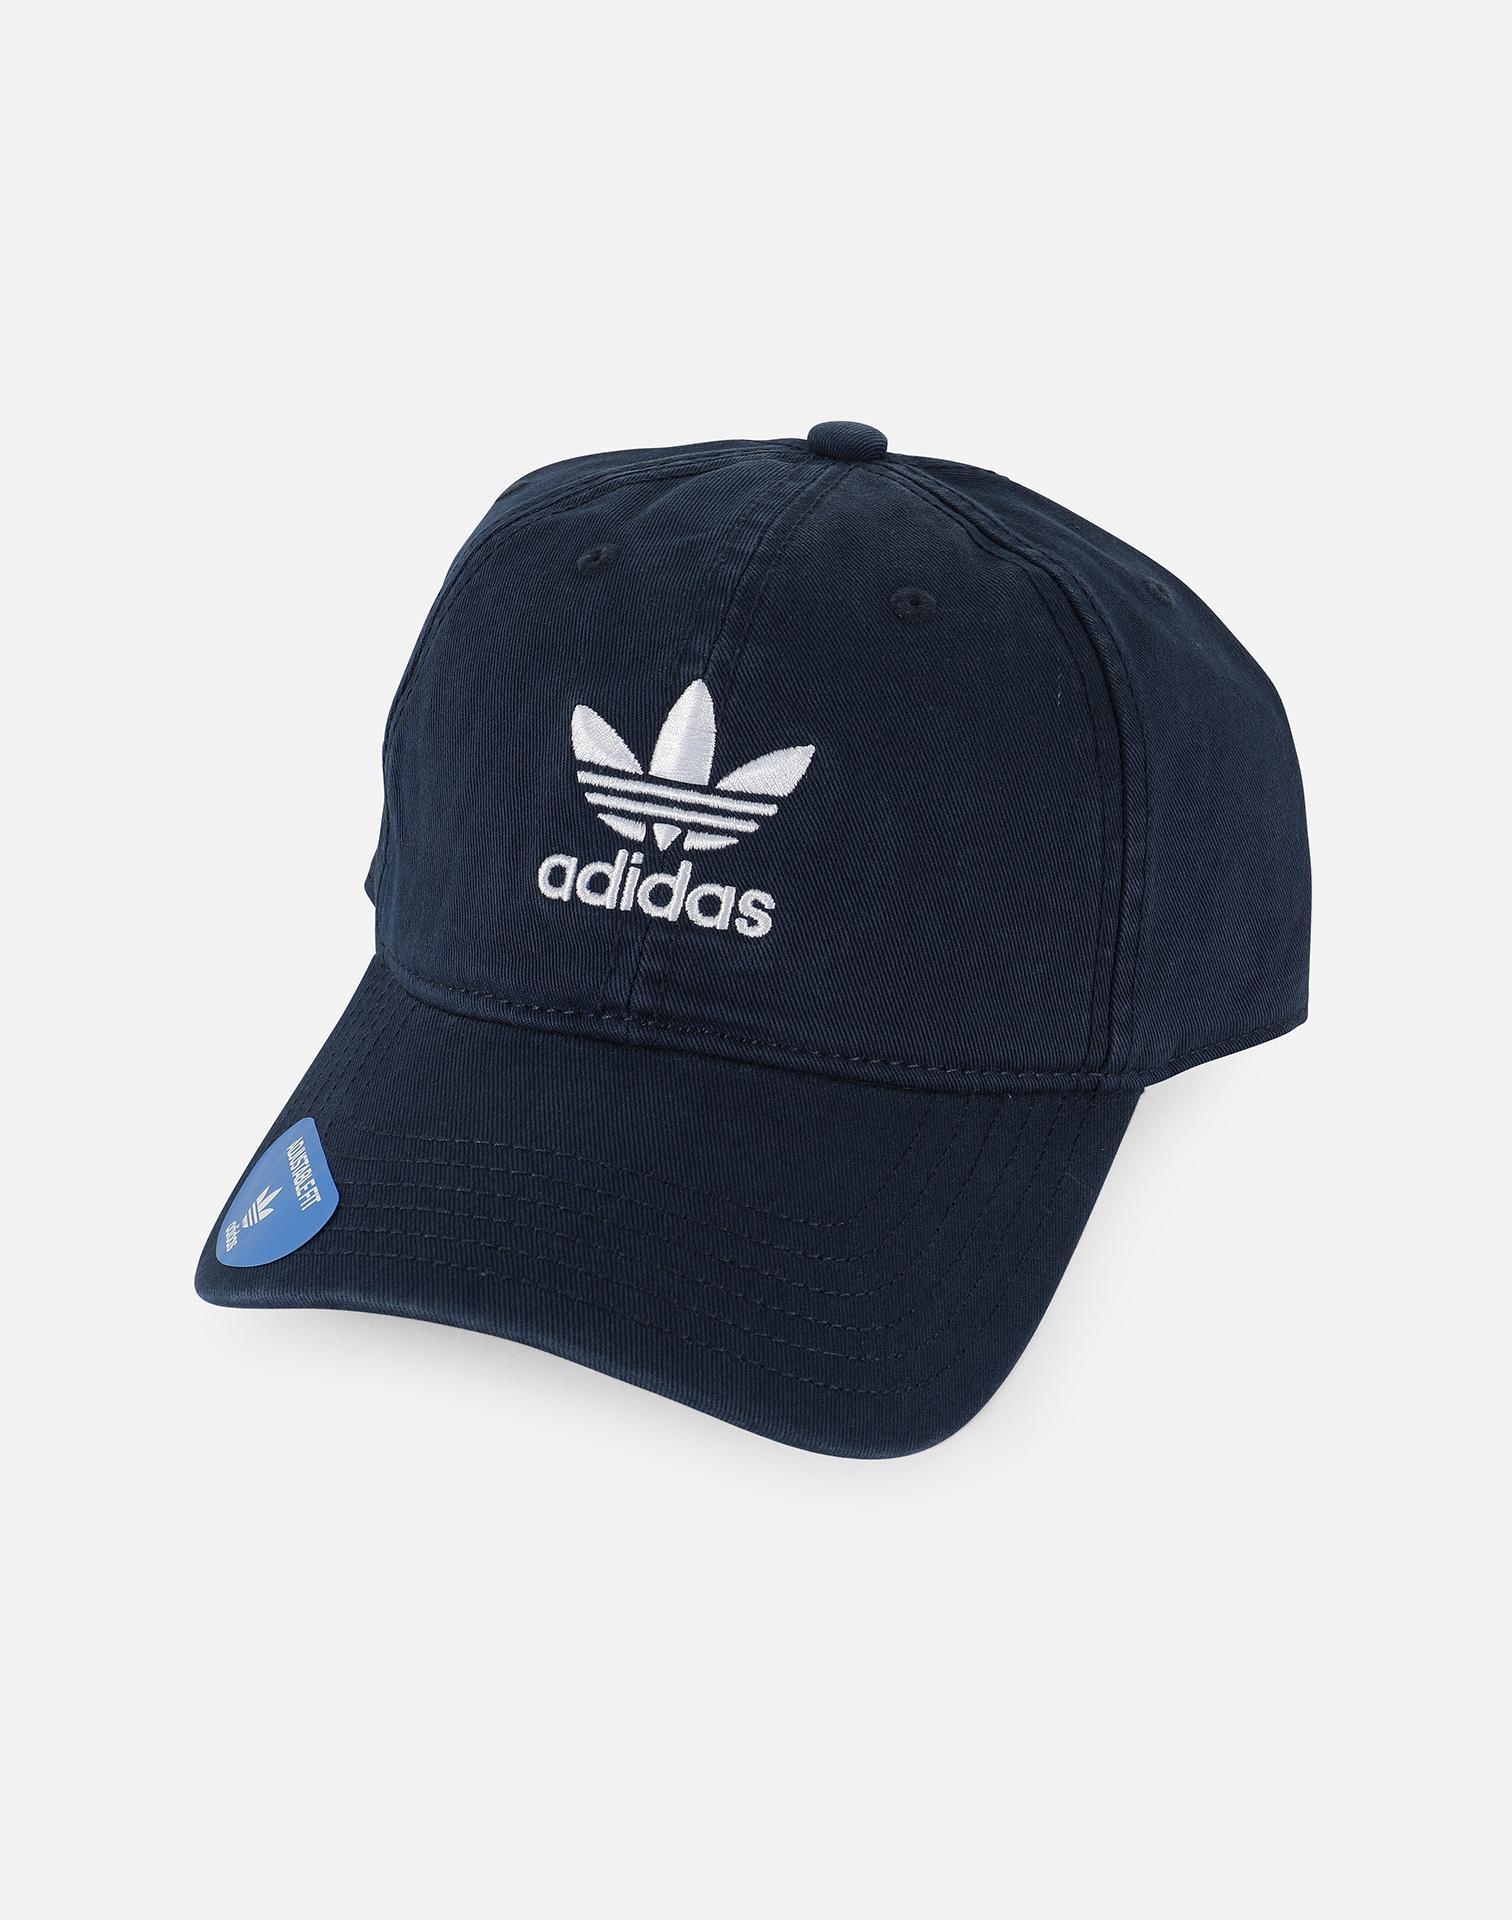 57d9474bfee Lyst - Adidas Originals Precurved Washed Strapback Hat in Blue for Men